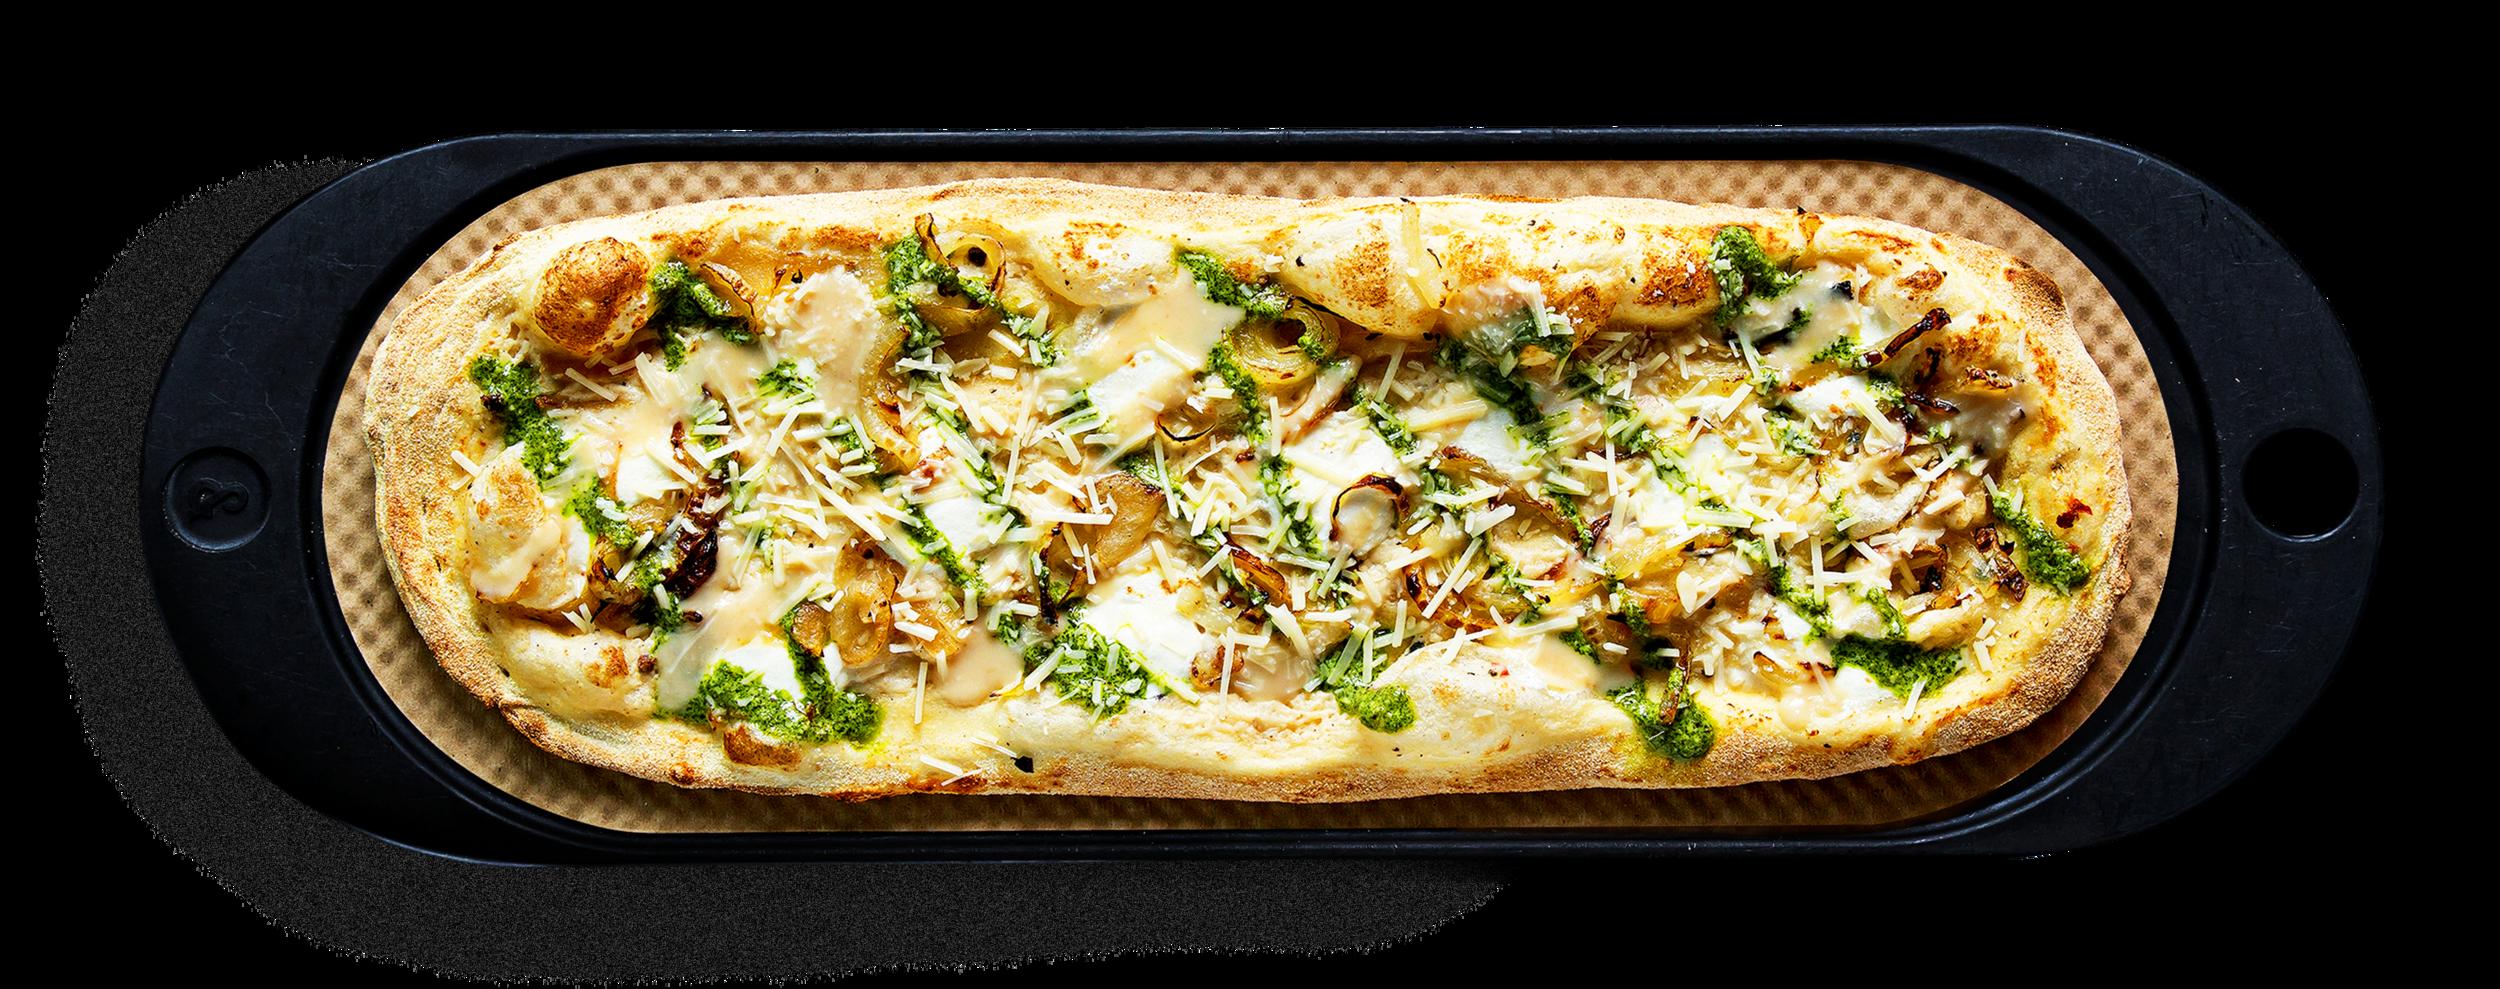 GNARLIC - Garlic ricotta, fresh mozzarella, grilled onion, basil pesto, garlic oil, parmesan